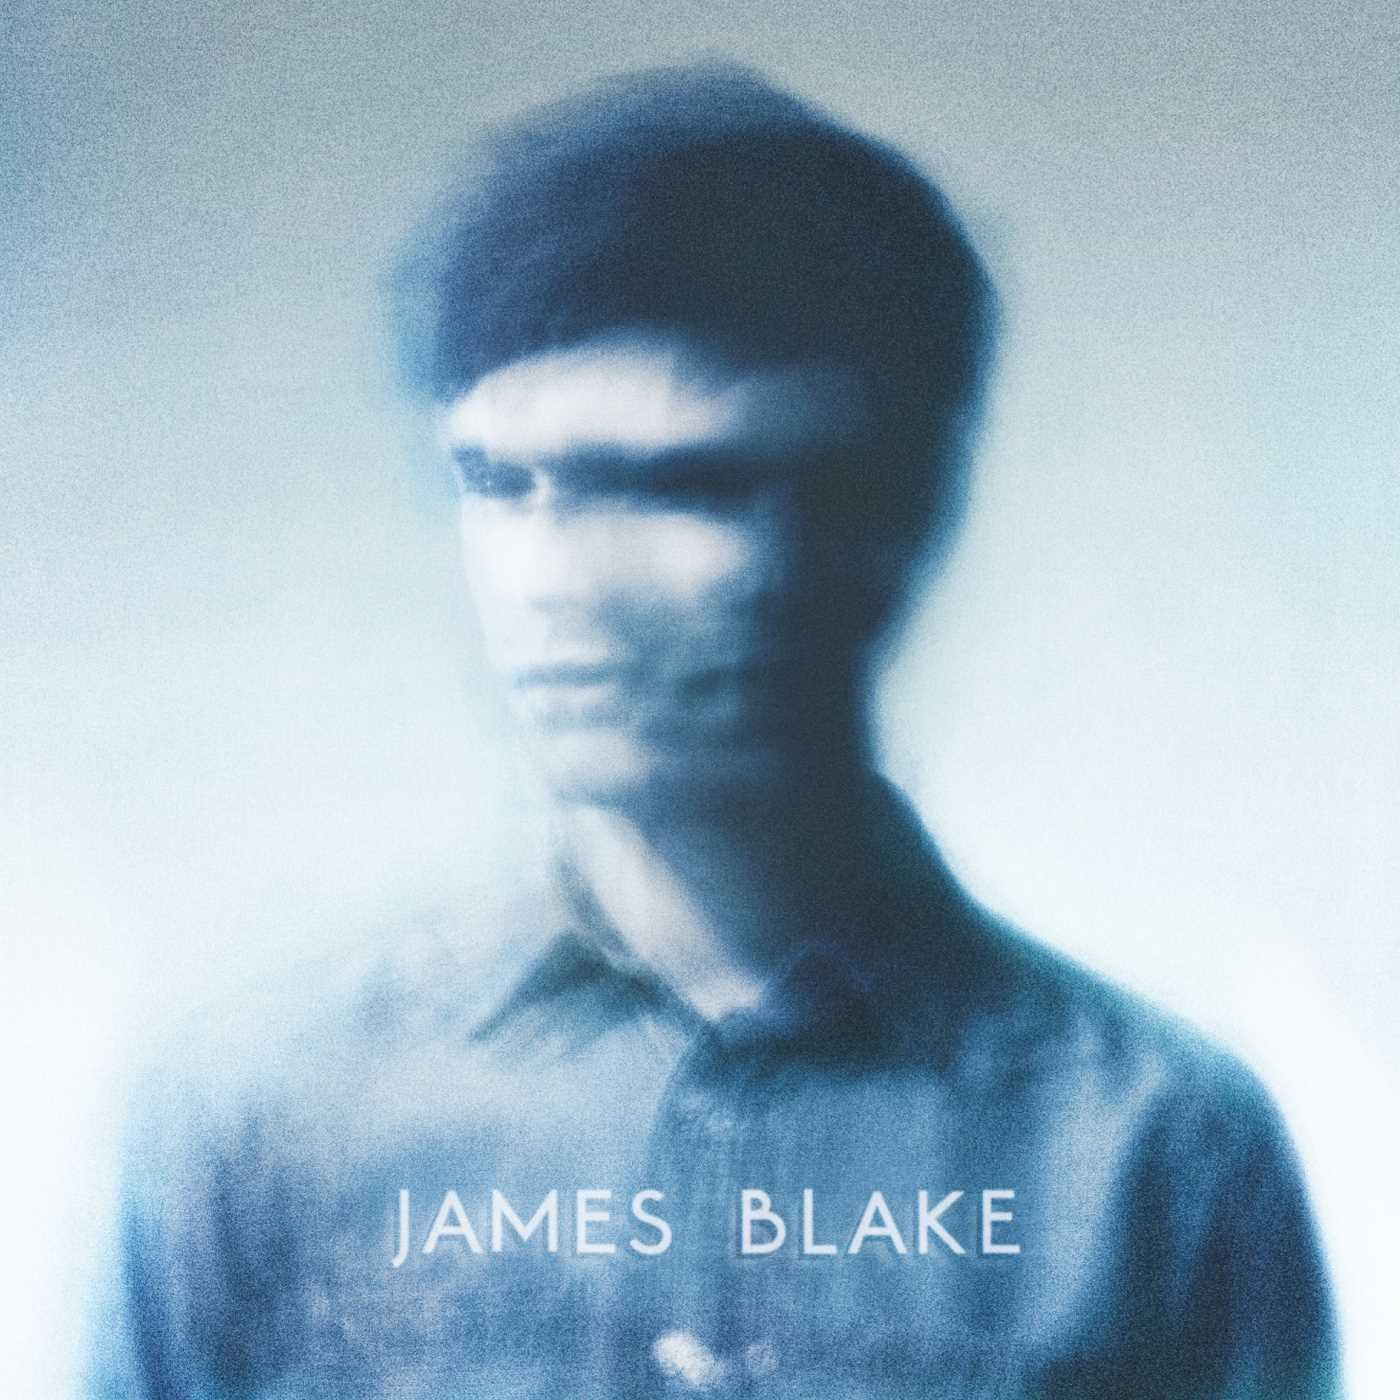 James Blake by CD